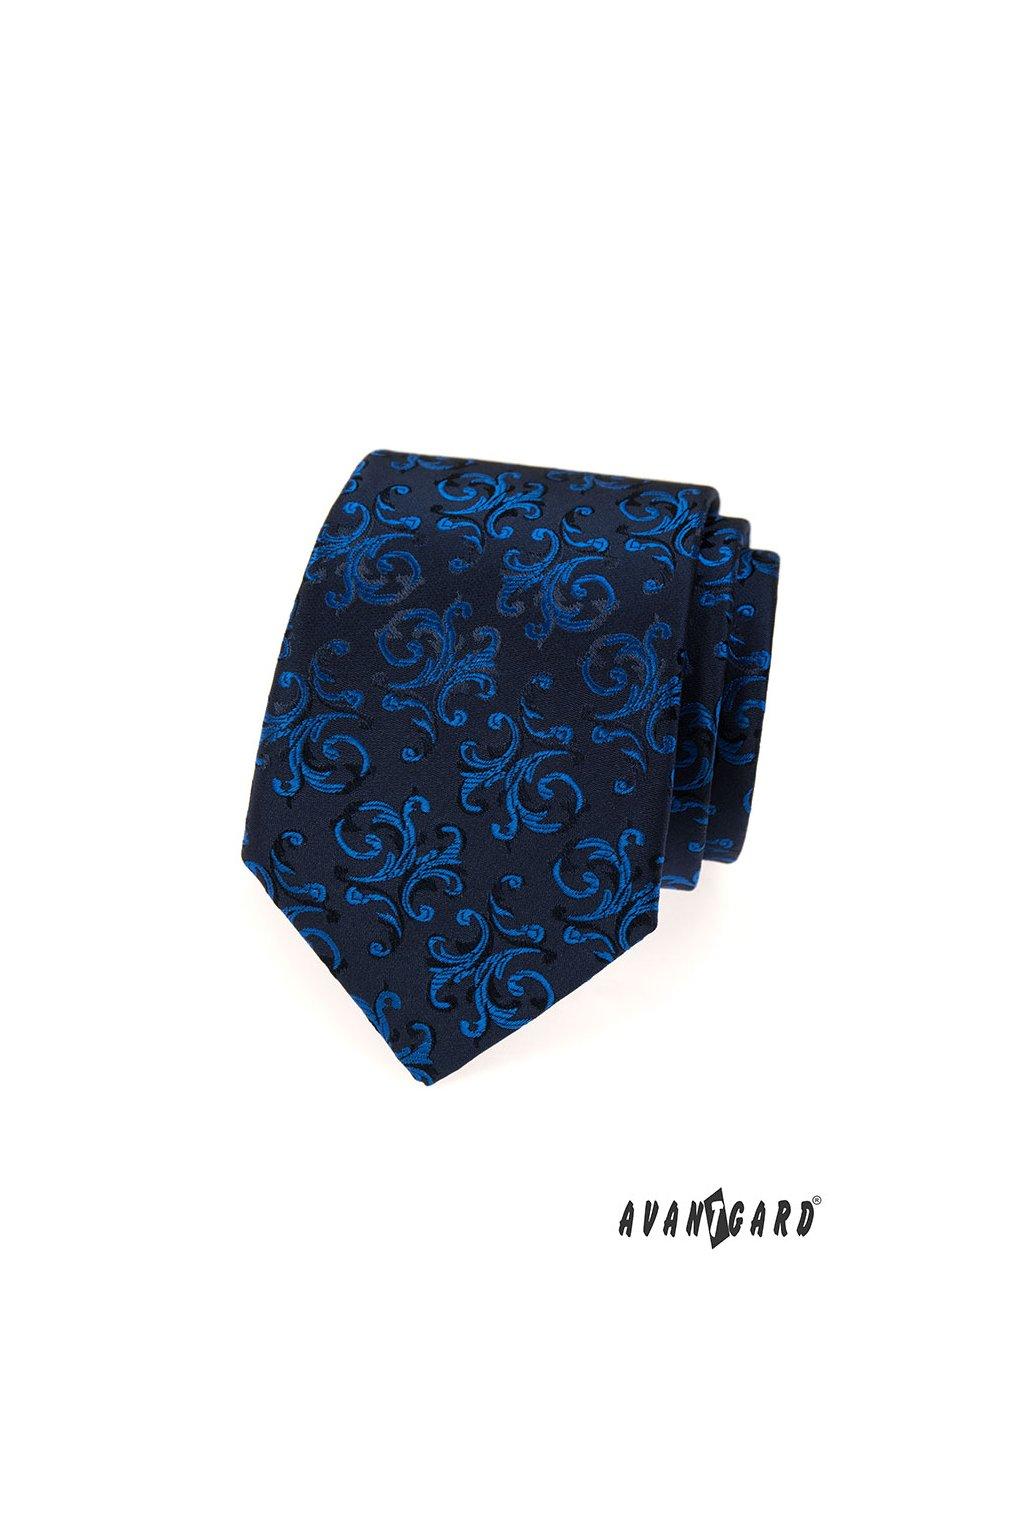 Tmavě modrá kravata světlý ornament 561 - 53